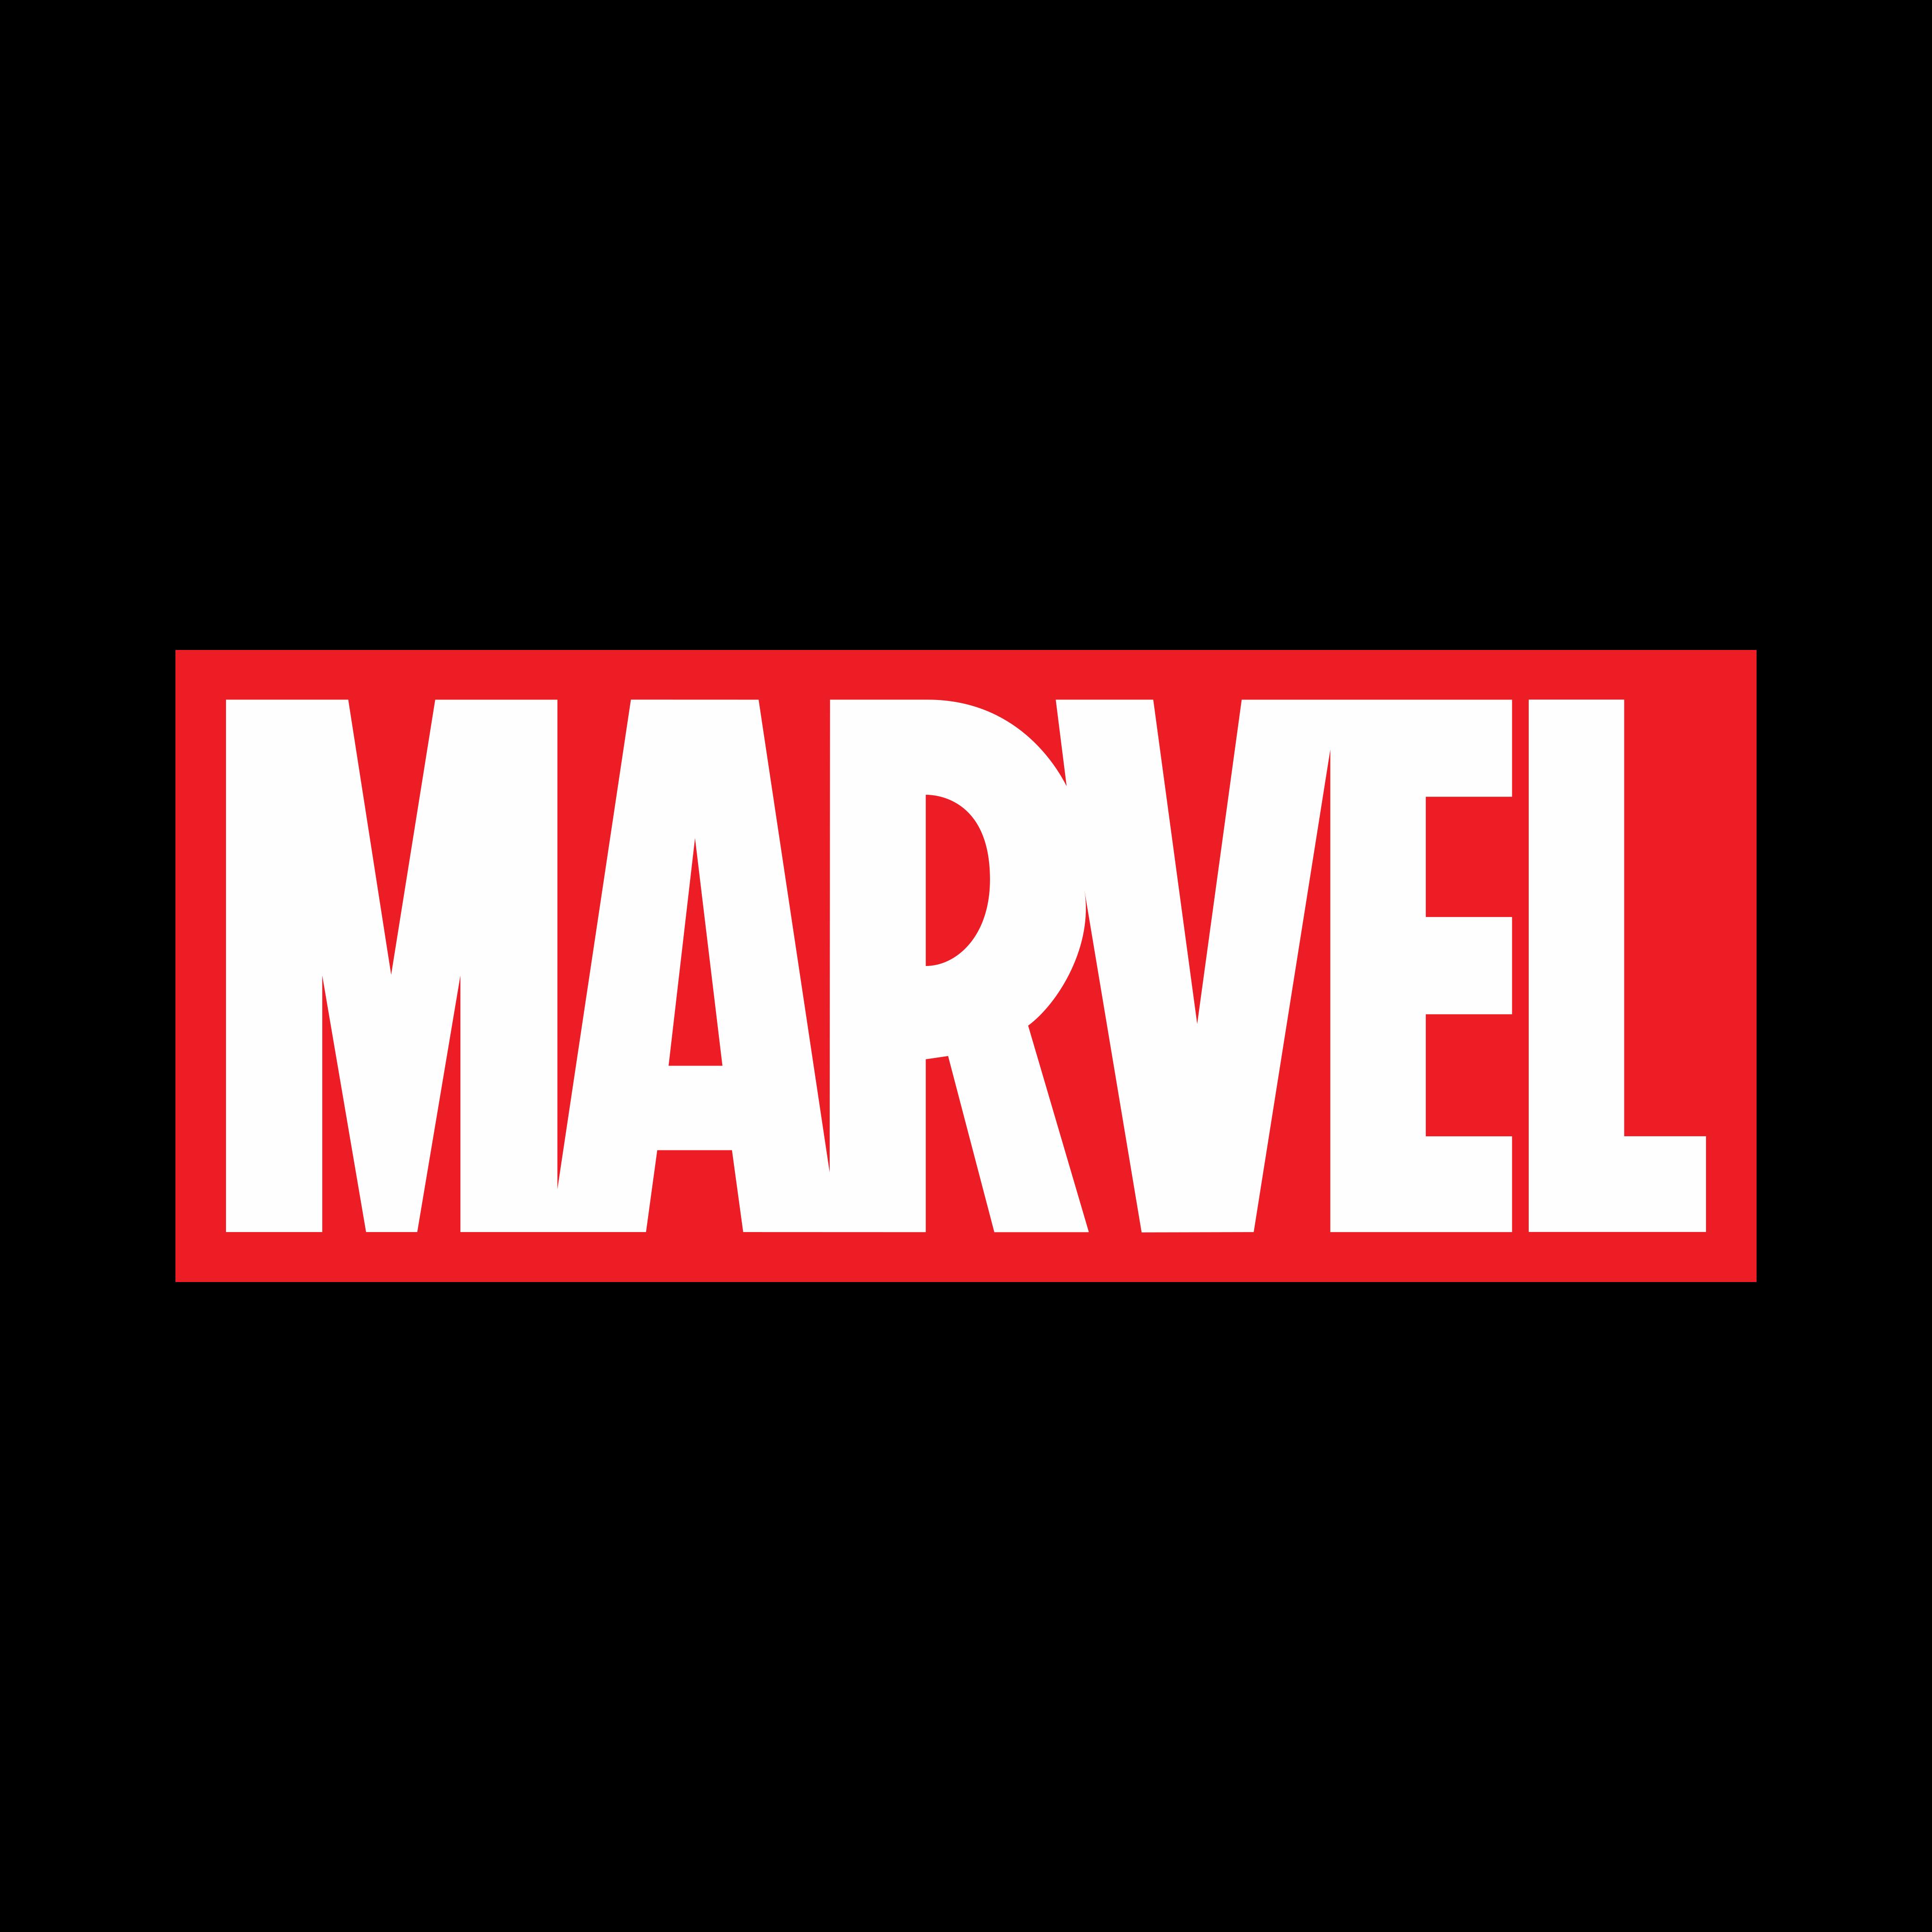 marvel logo 0 - Marvel Logo